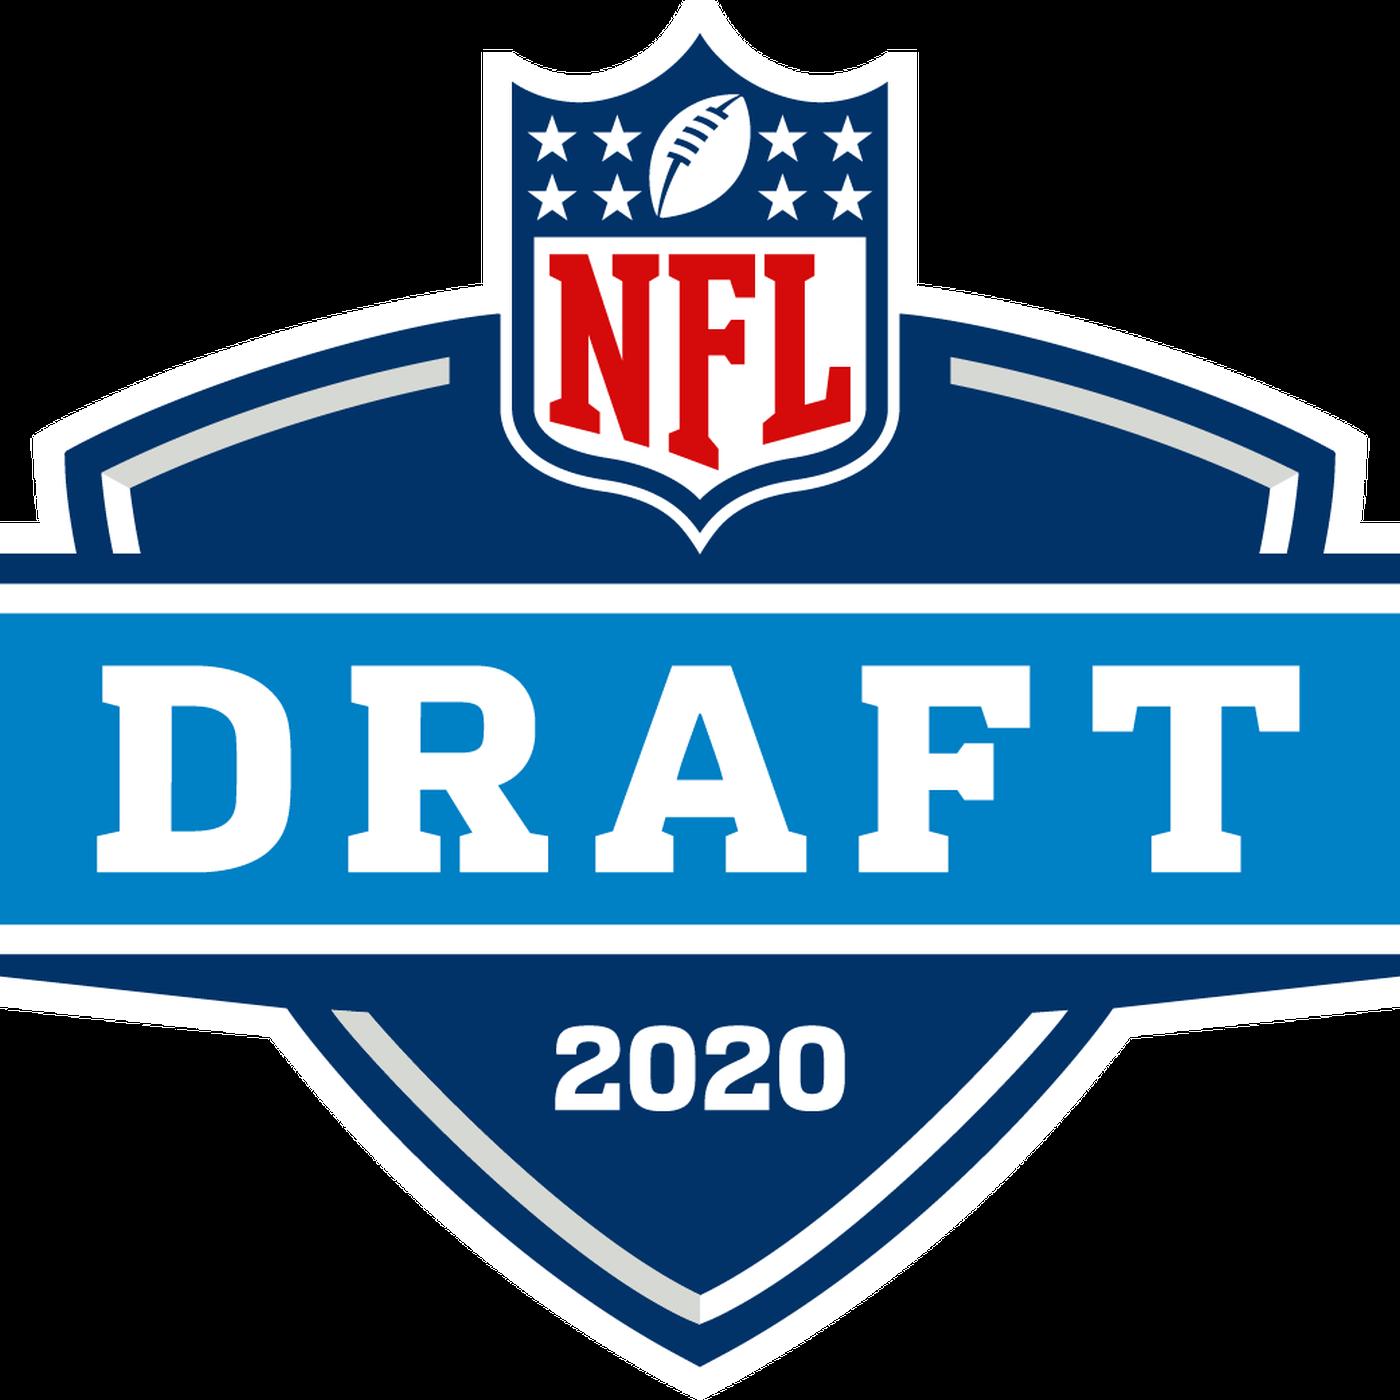 NFL Draft 2020